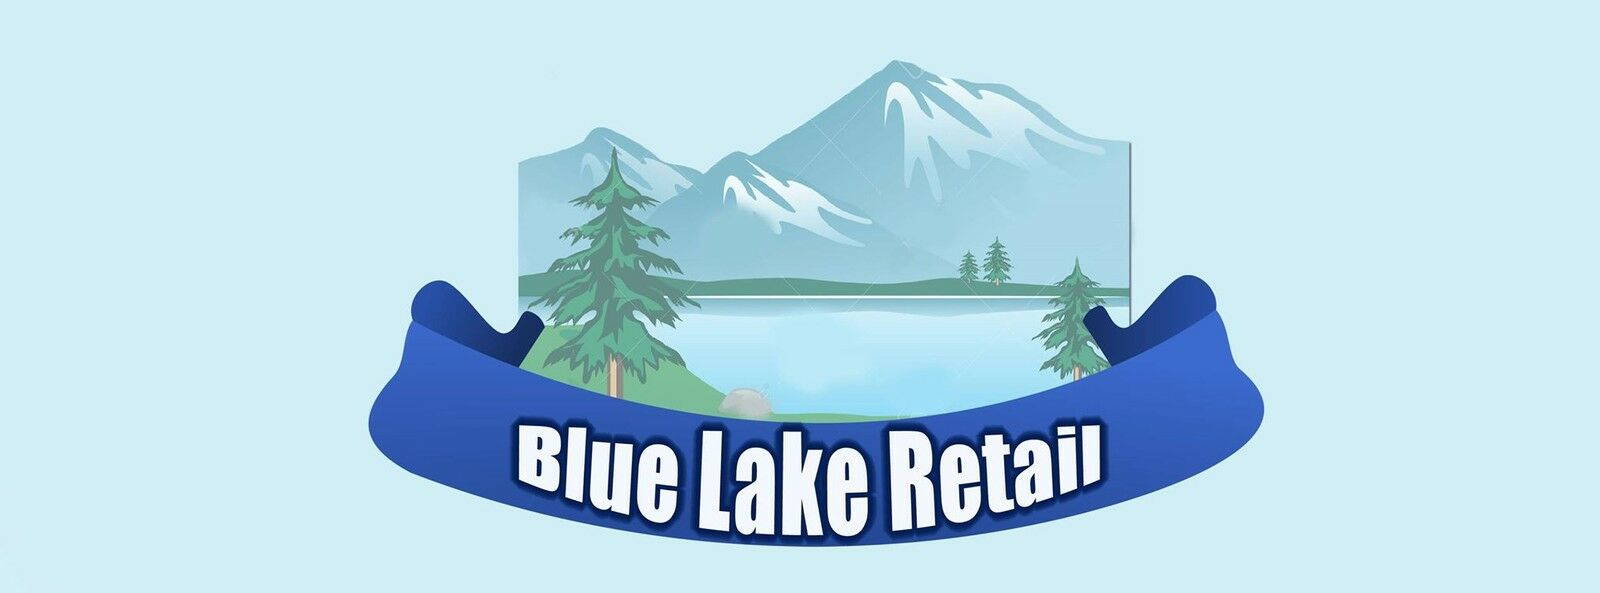 Blue Lake Retail